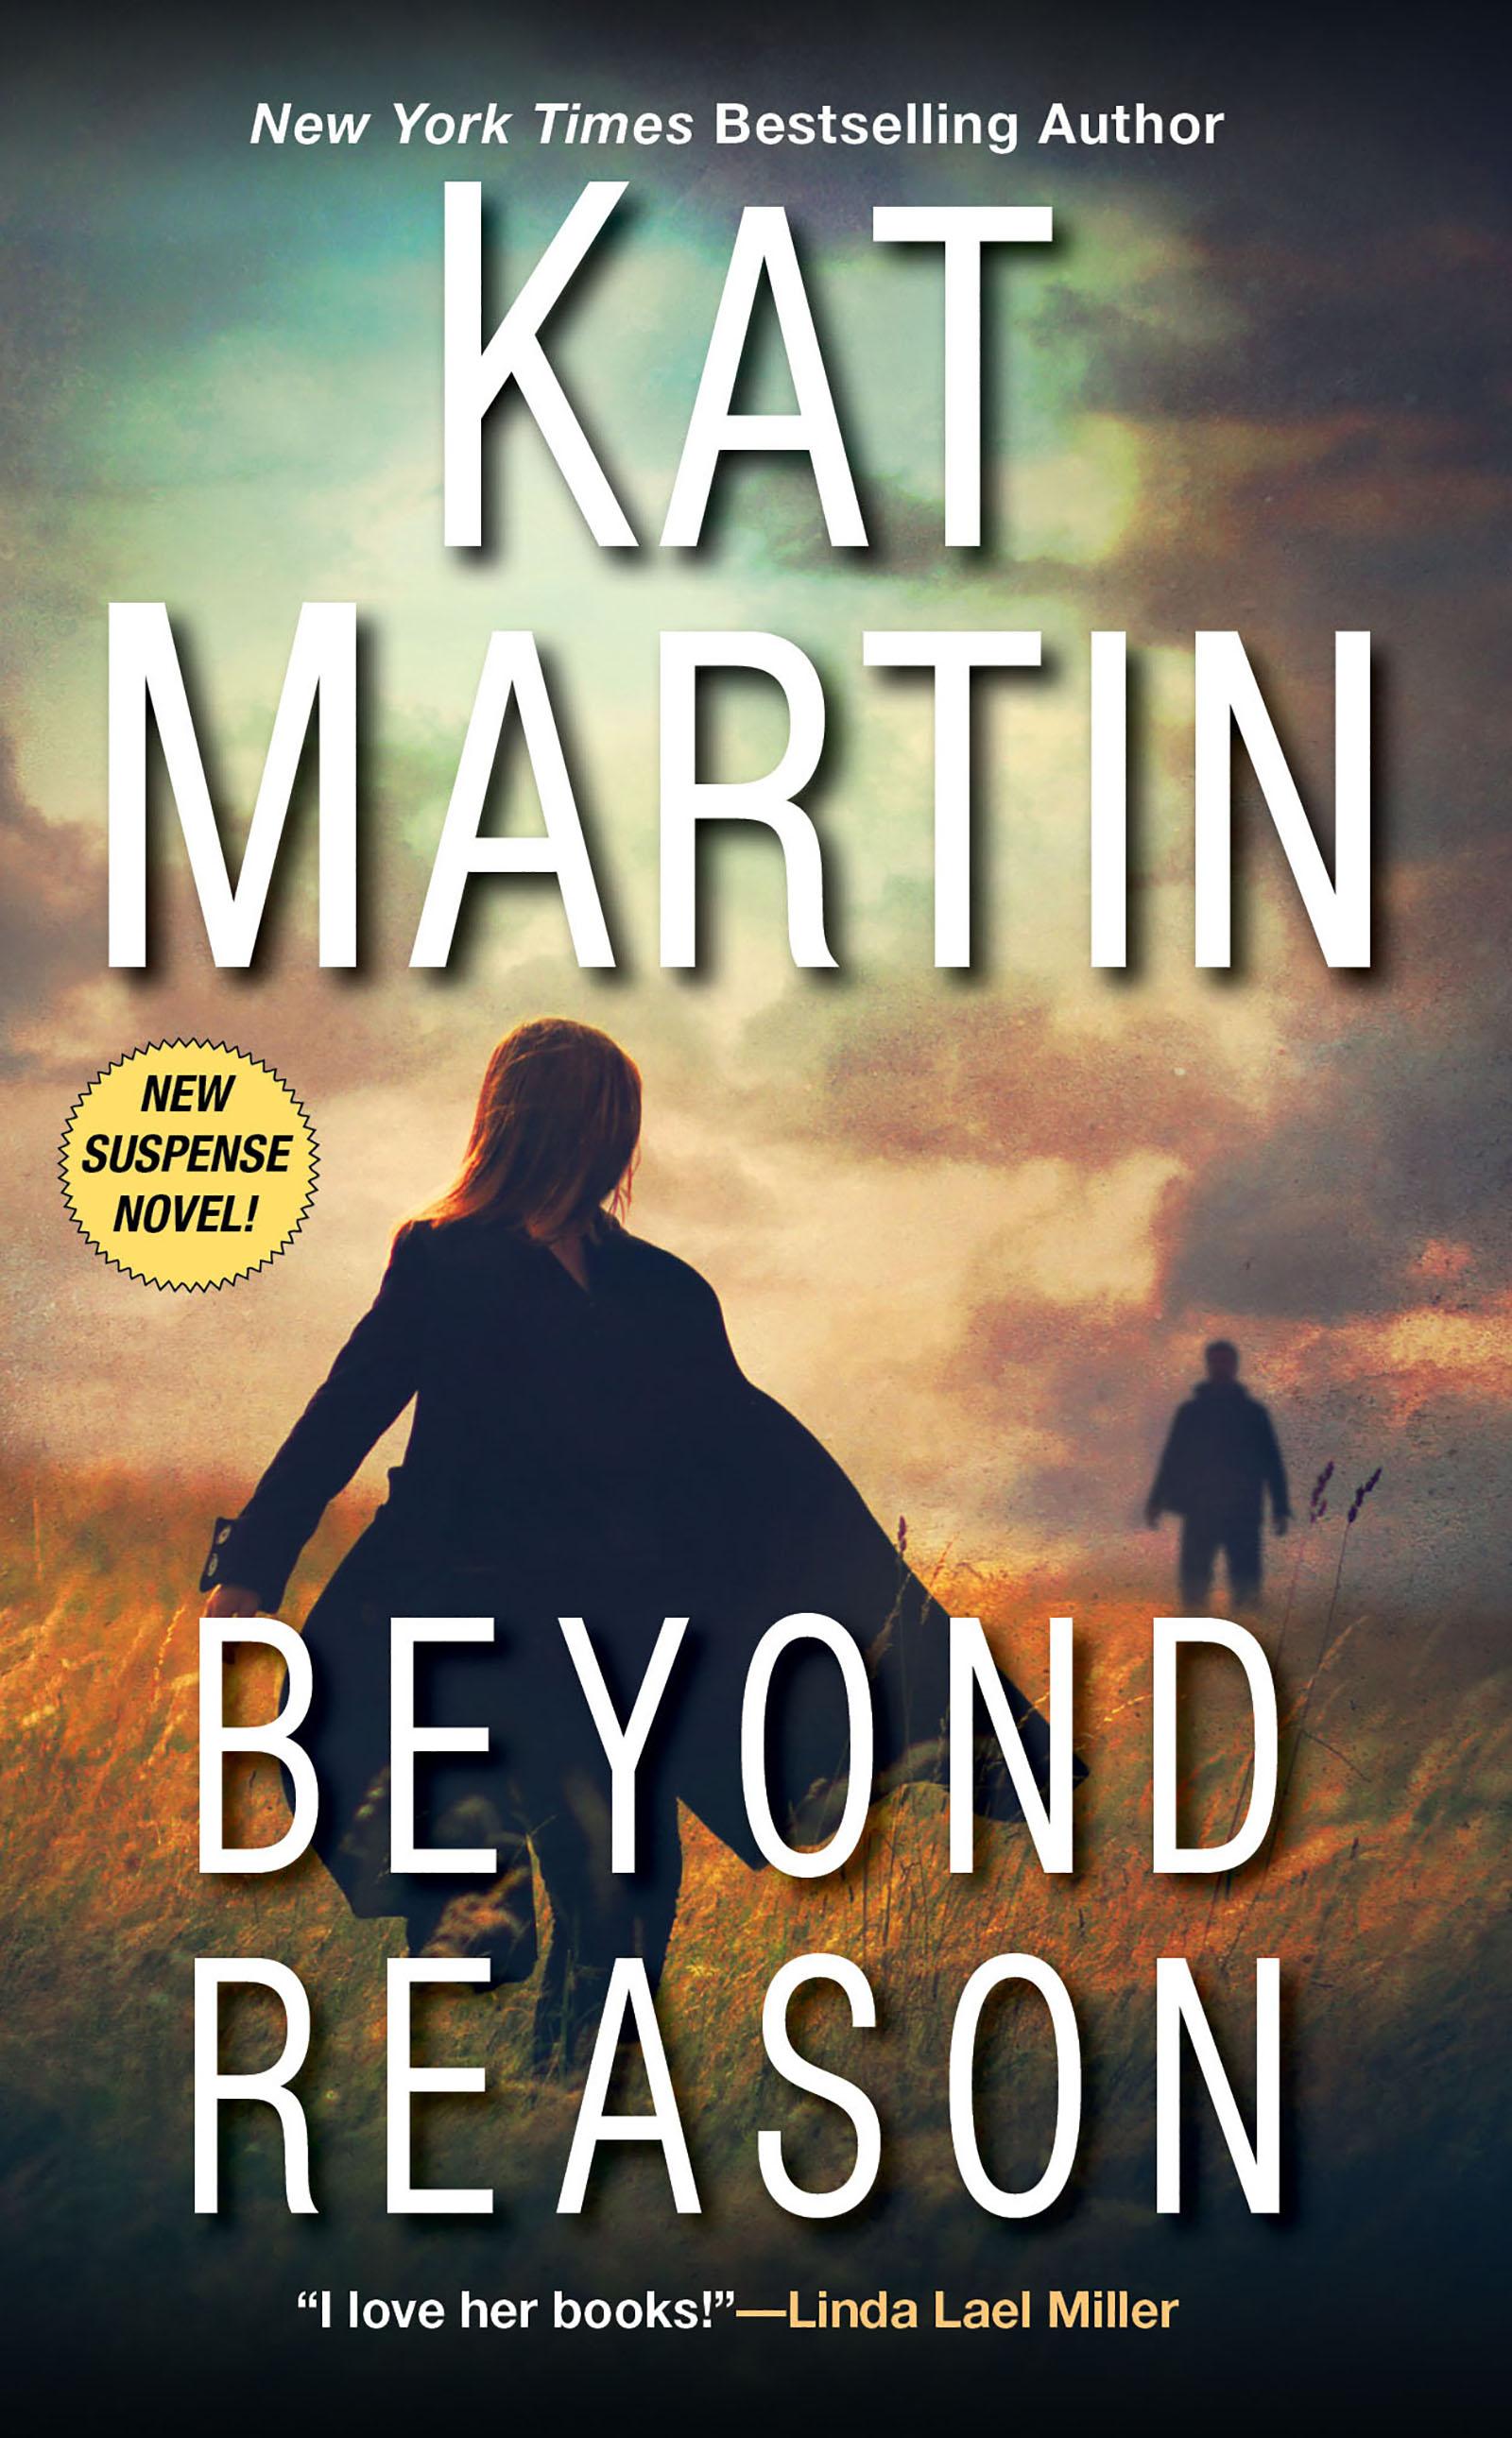 Beyond reason cover image